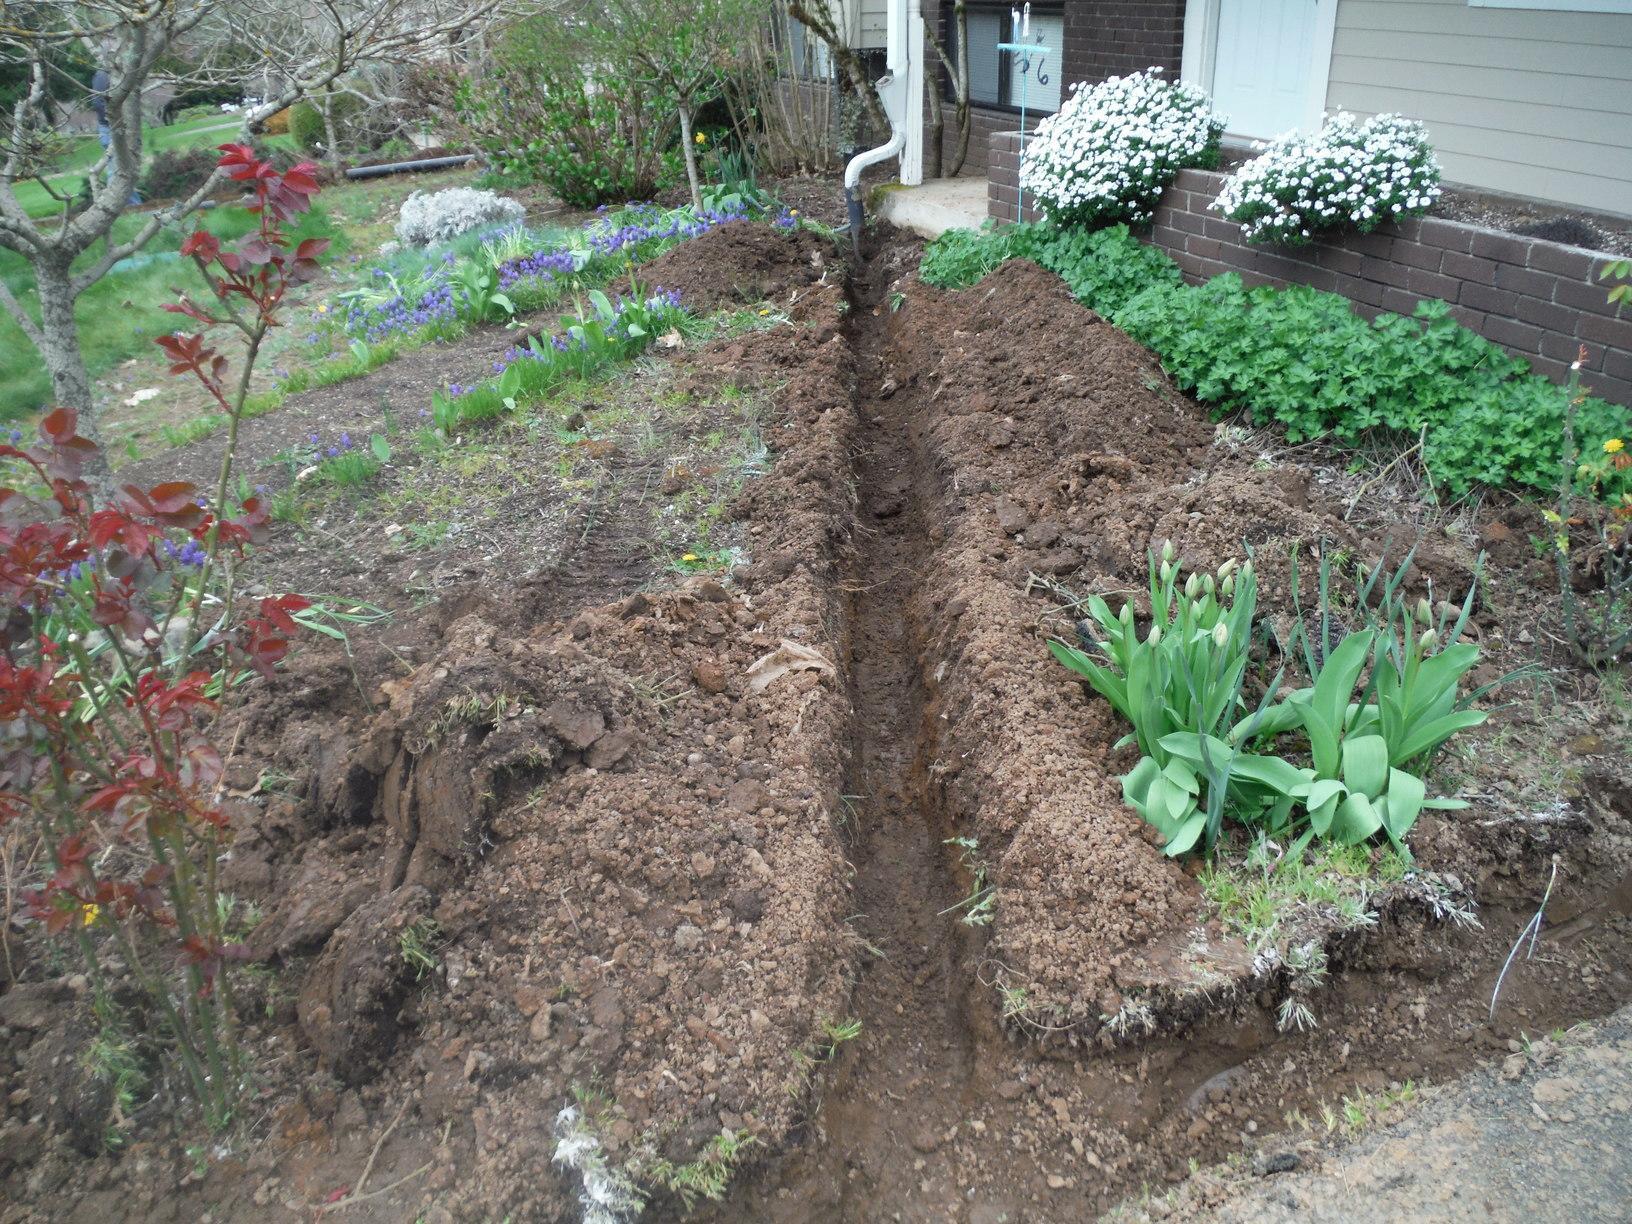 Yard drain line pre-installation